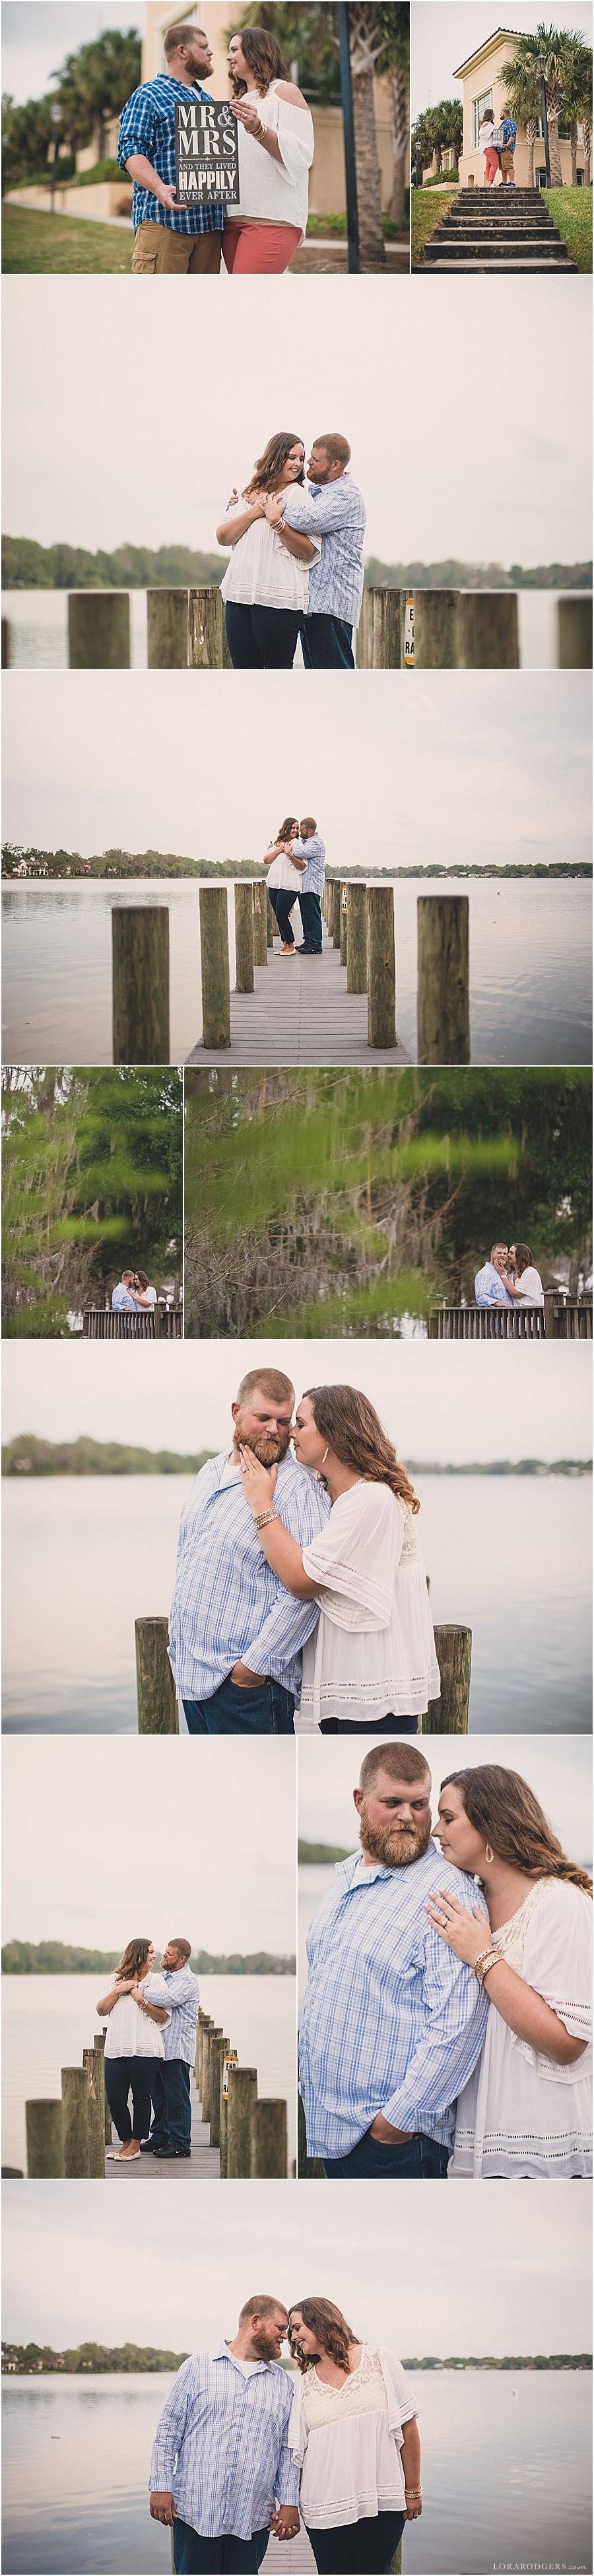 Rollins_College_Winter_Park_Florida_Engagement_004